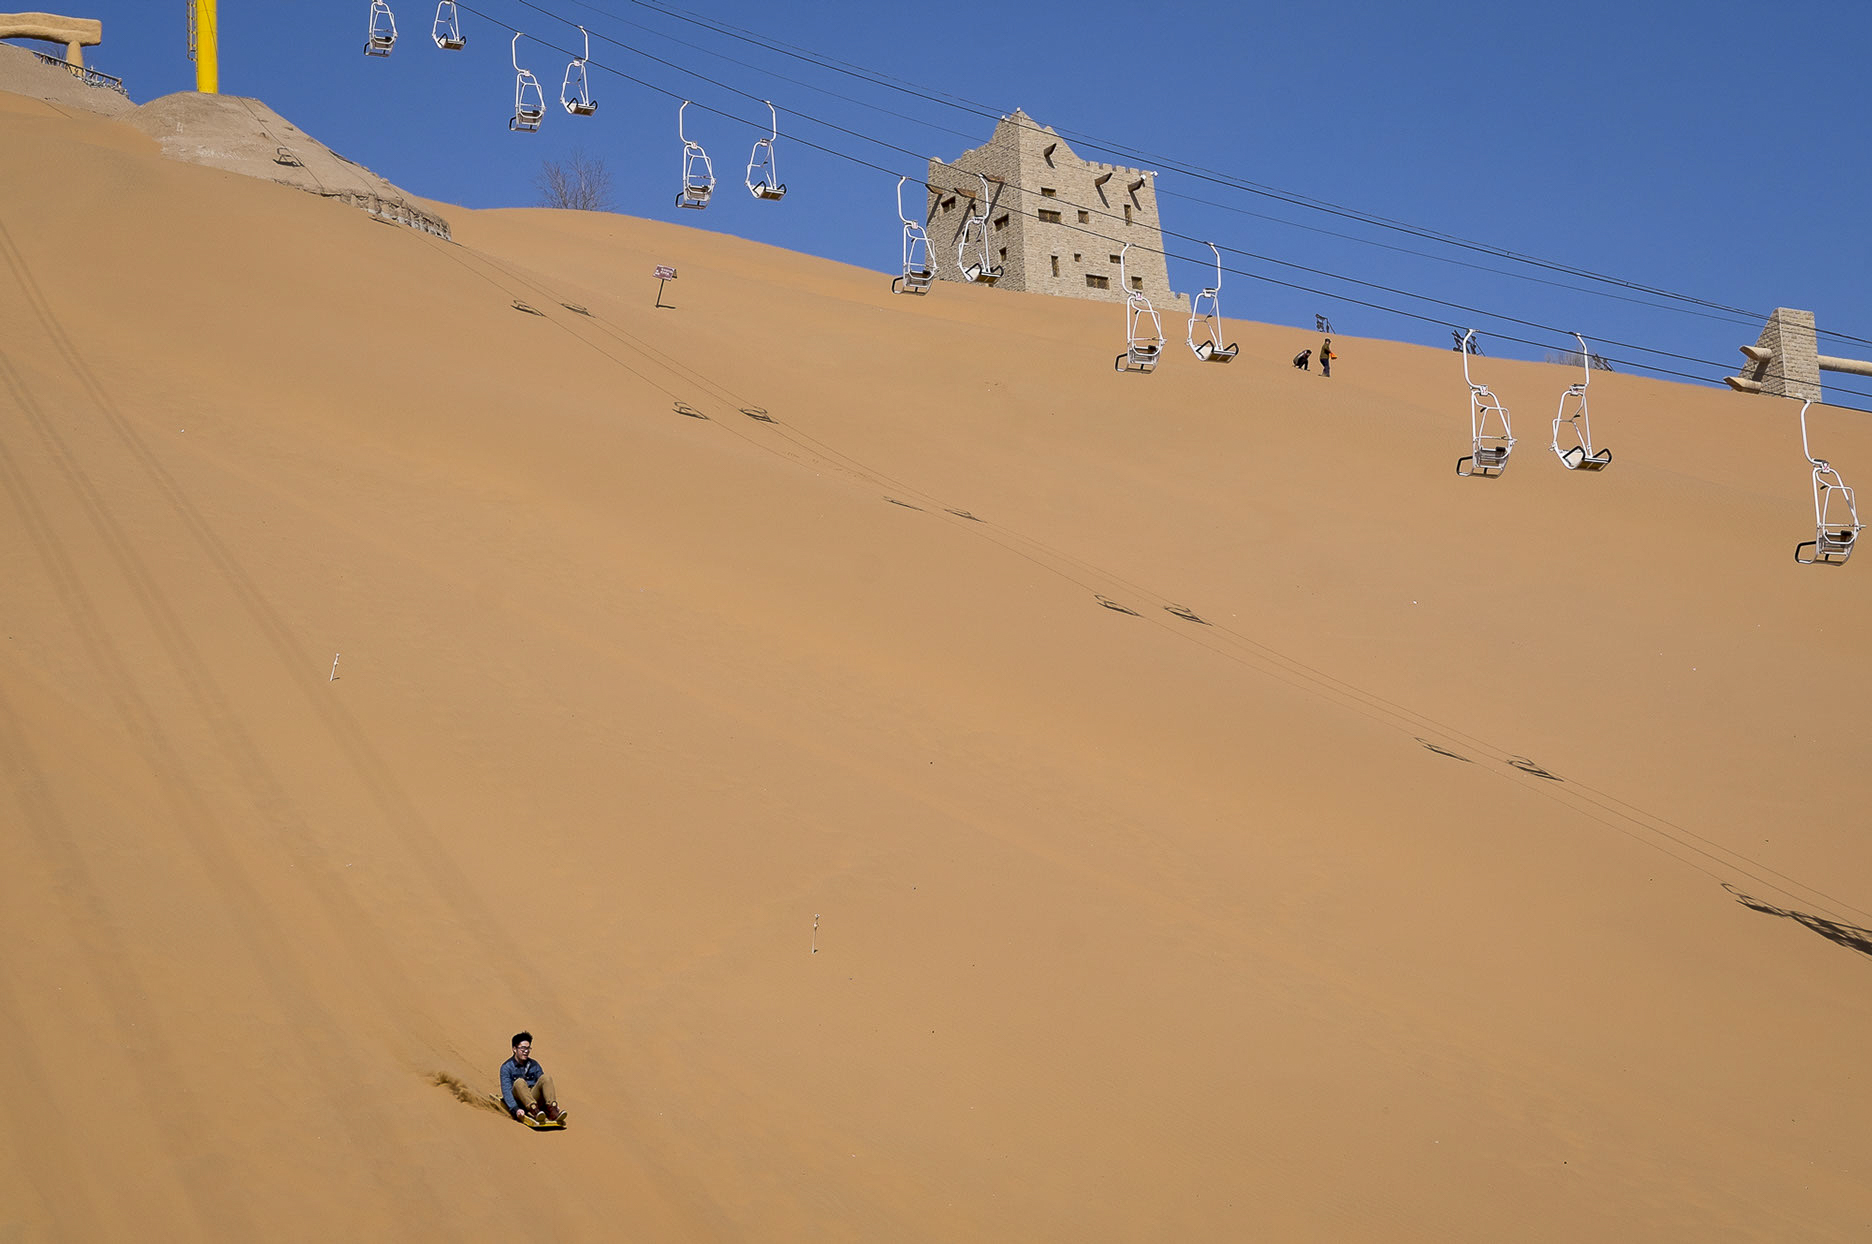 07-10977-The land of sand-07.jpg